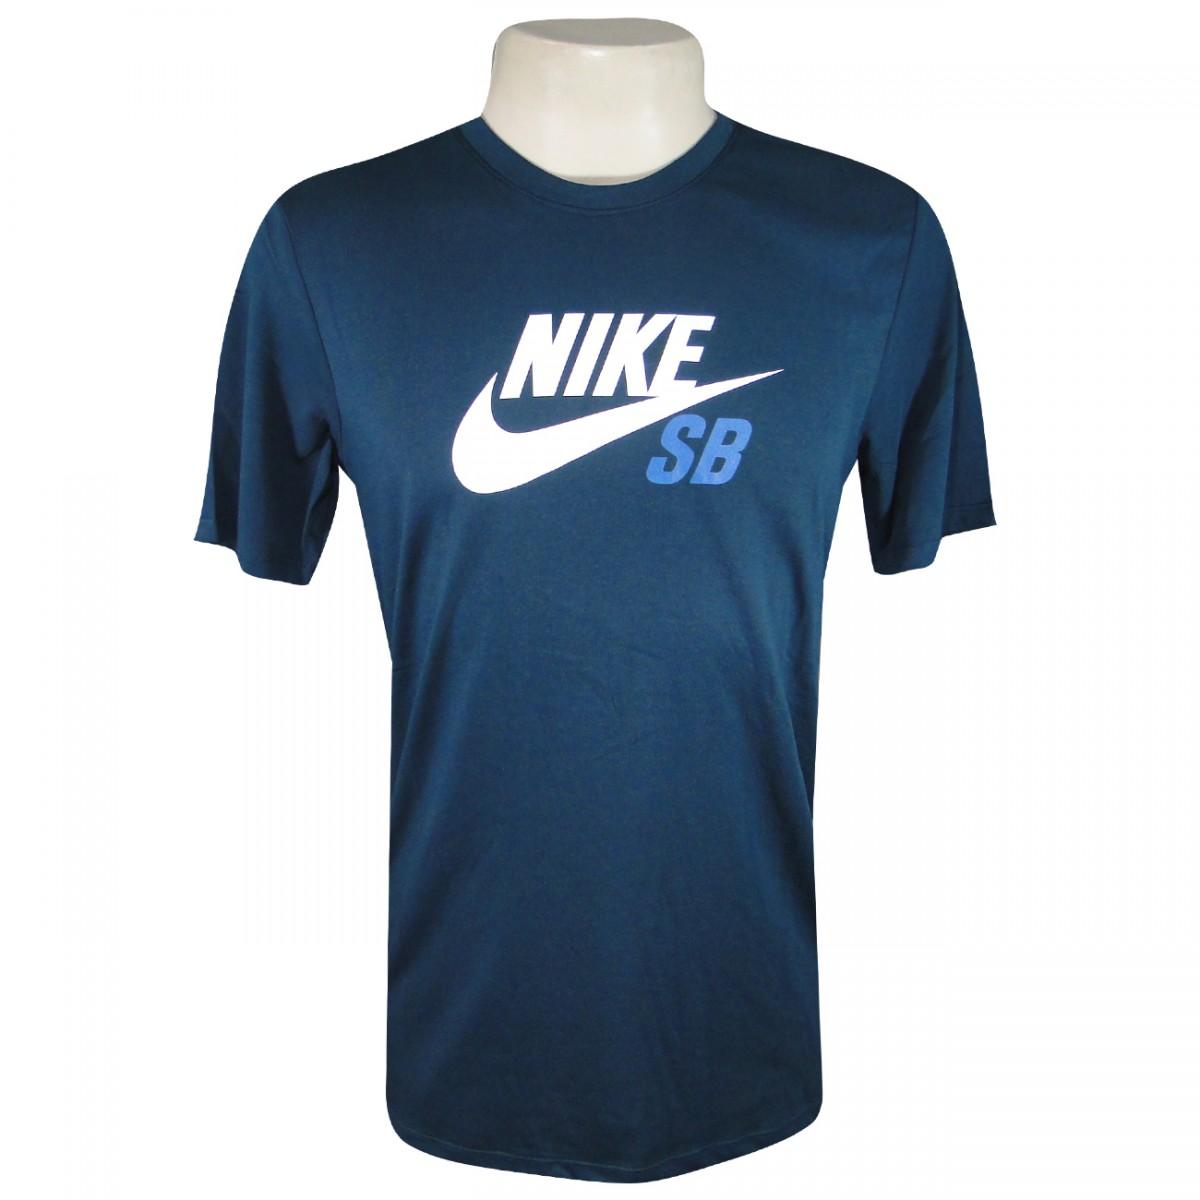 ddd227fd9b154 Camiseta Nike SB 698250 698250 464 - Petroleo - Chuteira Nike ...